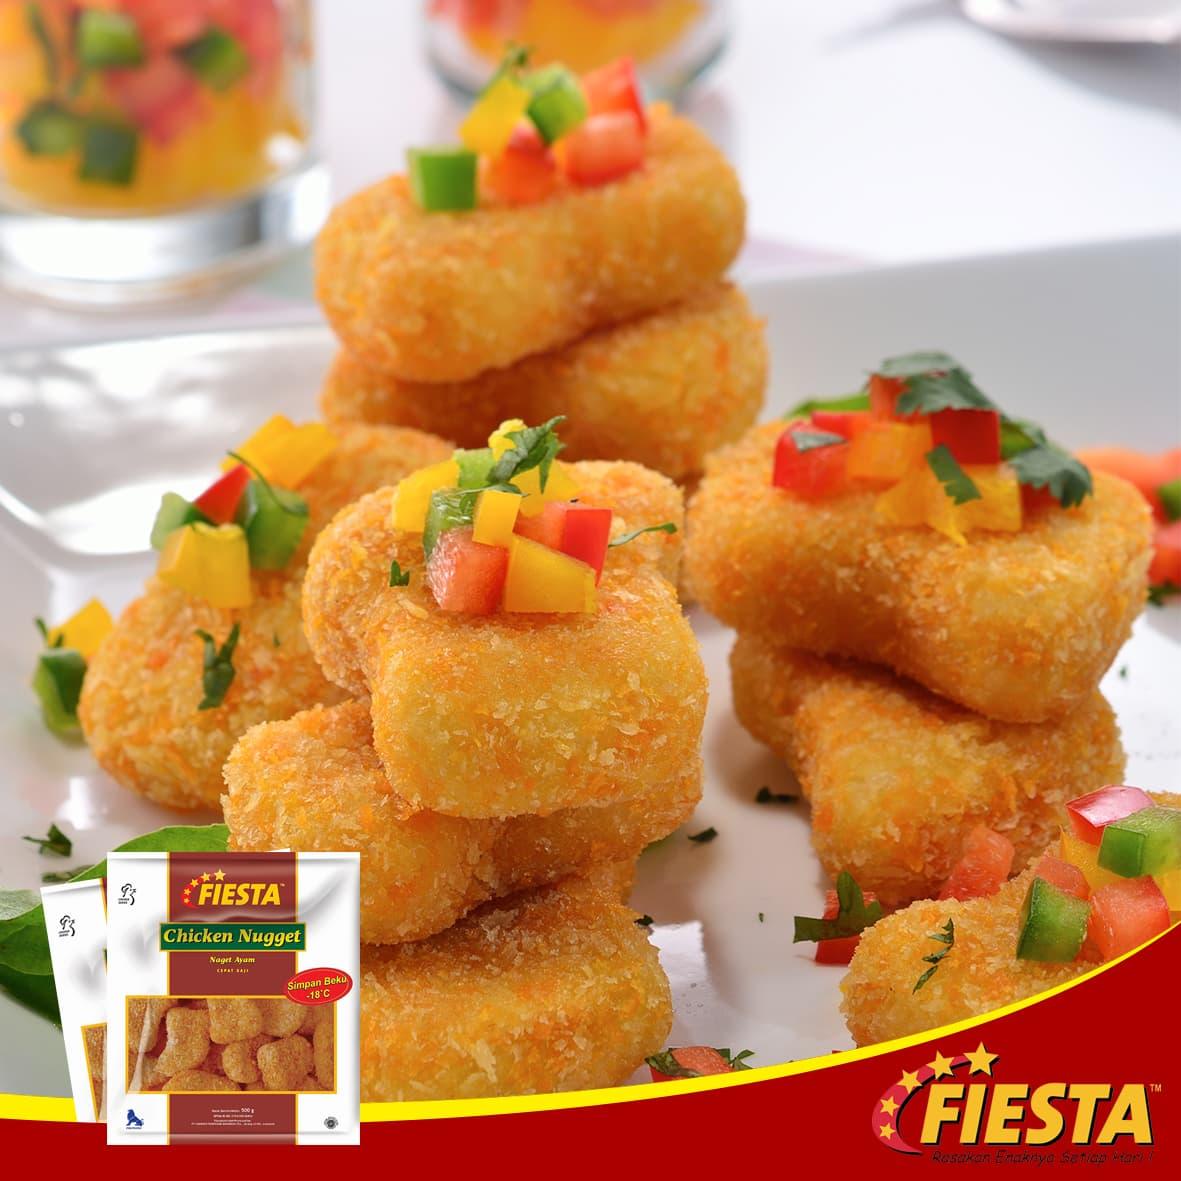 Fiesta Paket Nugget Makanan Instan 500 G (3 Pcs) - Blanja.com